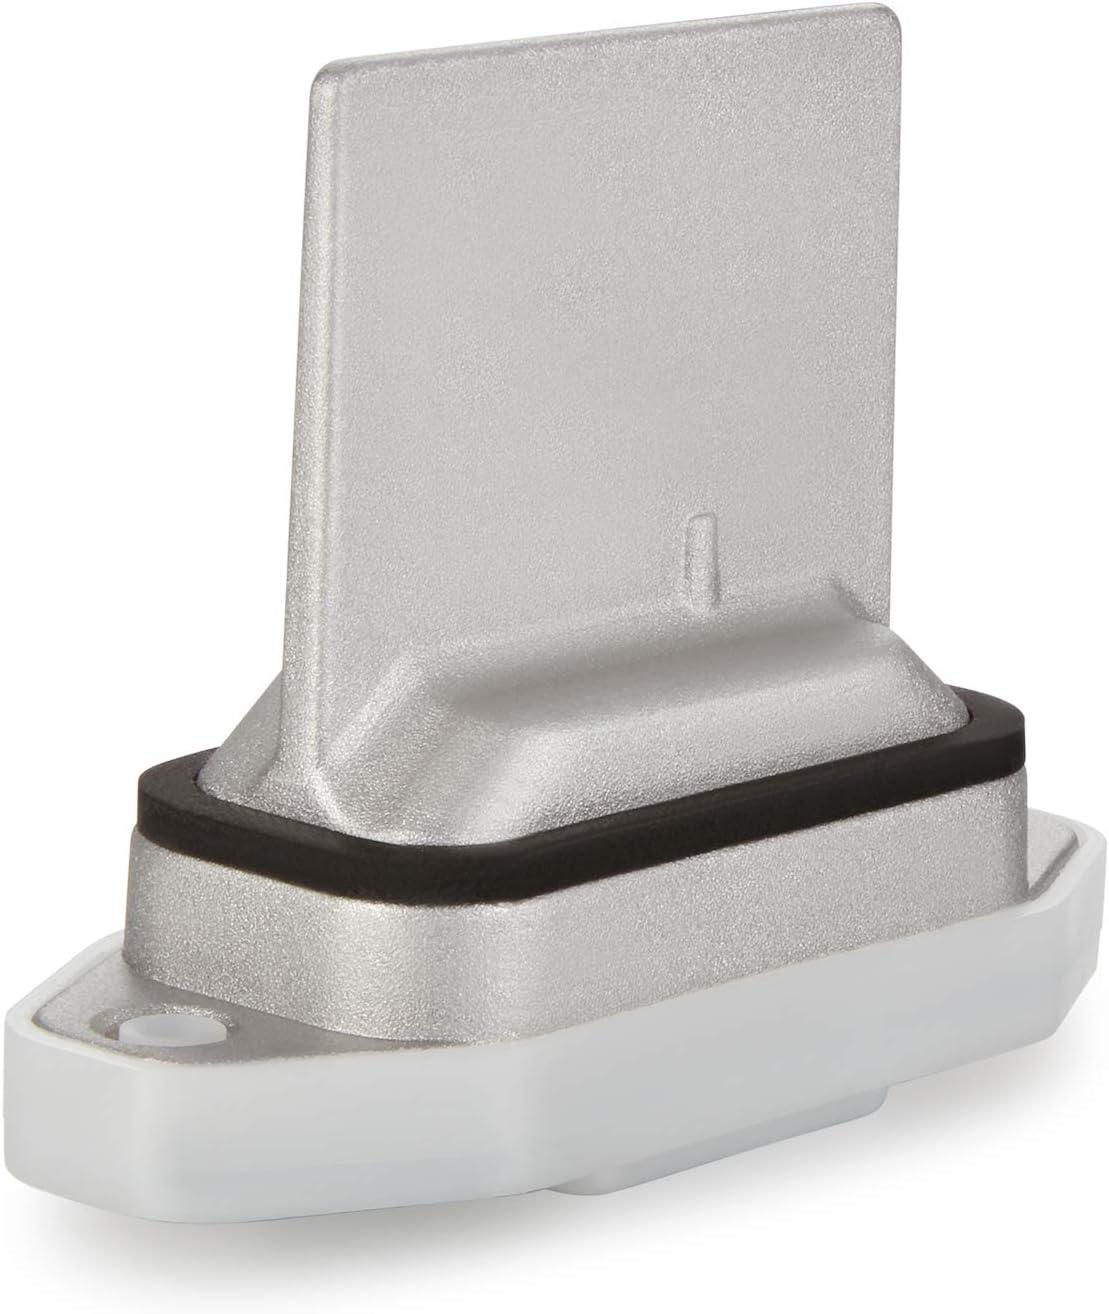 G Madlife Garage Heater Fan Blower Motor Resistor 277612Y000 RU633 For 2002-2006 Nissan Altima 2000-2008 Maxima